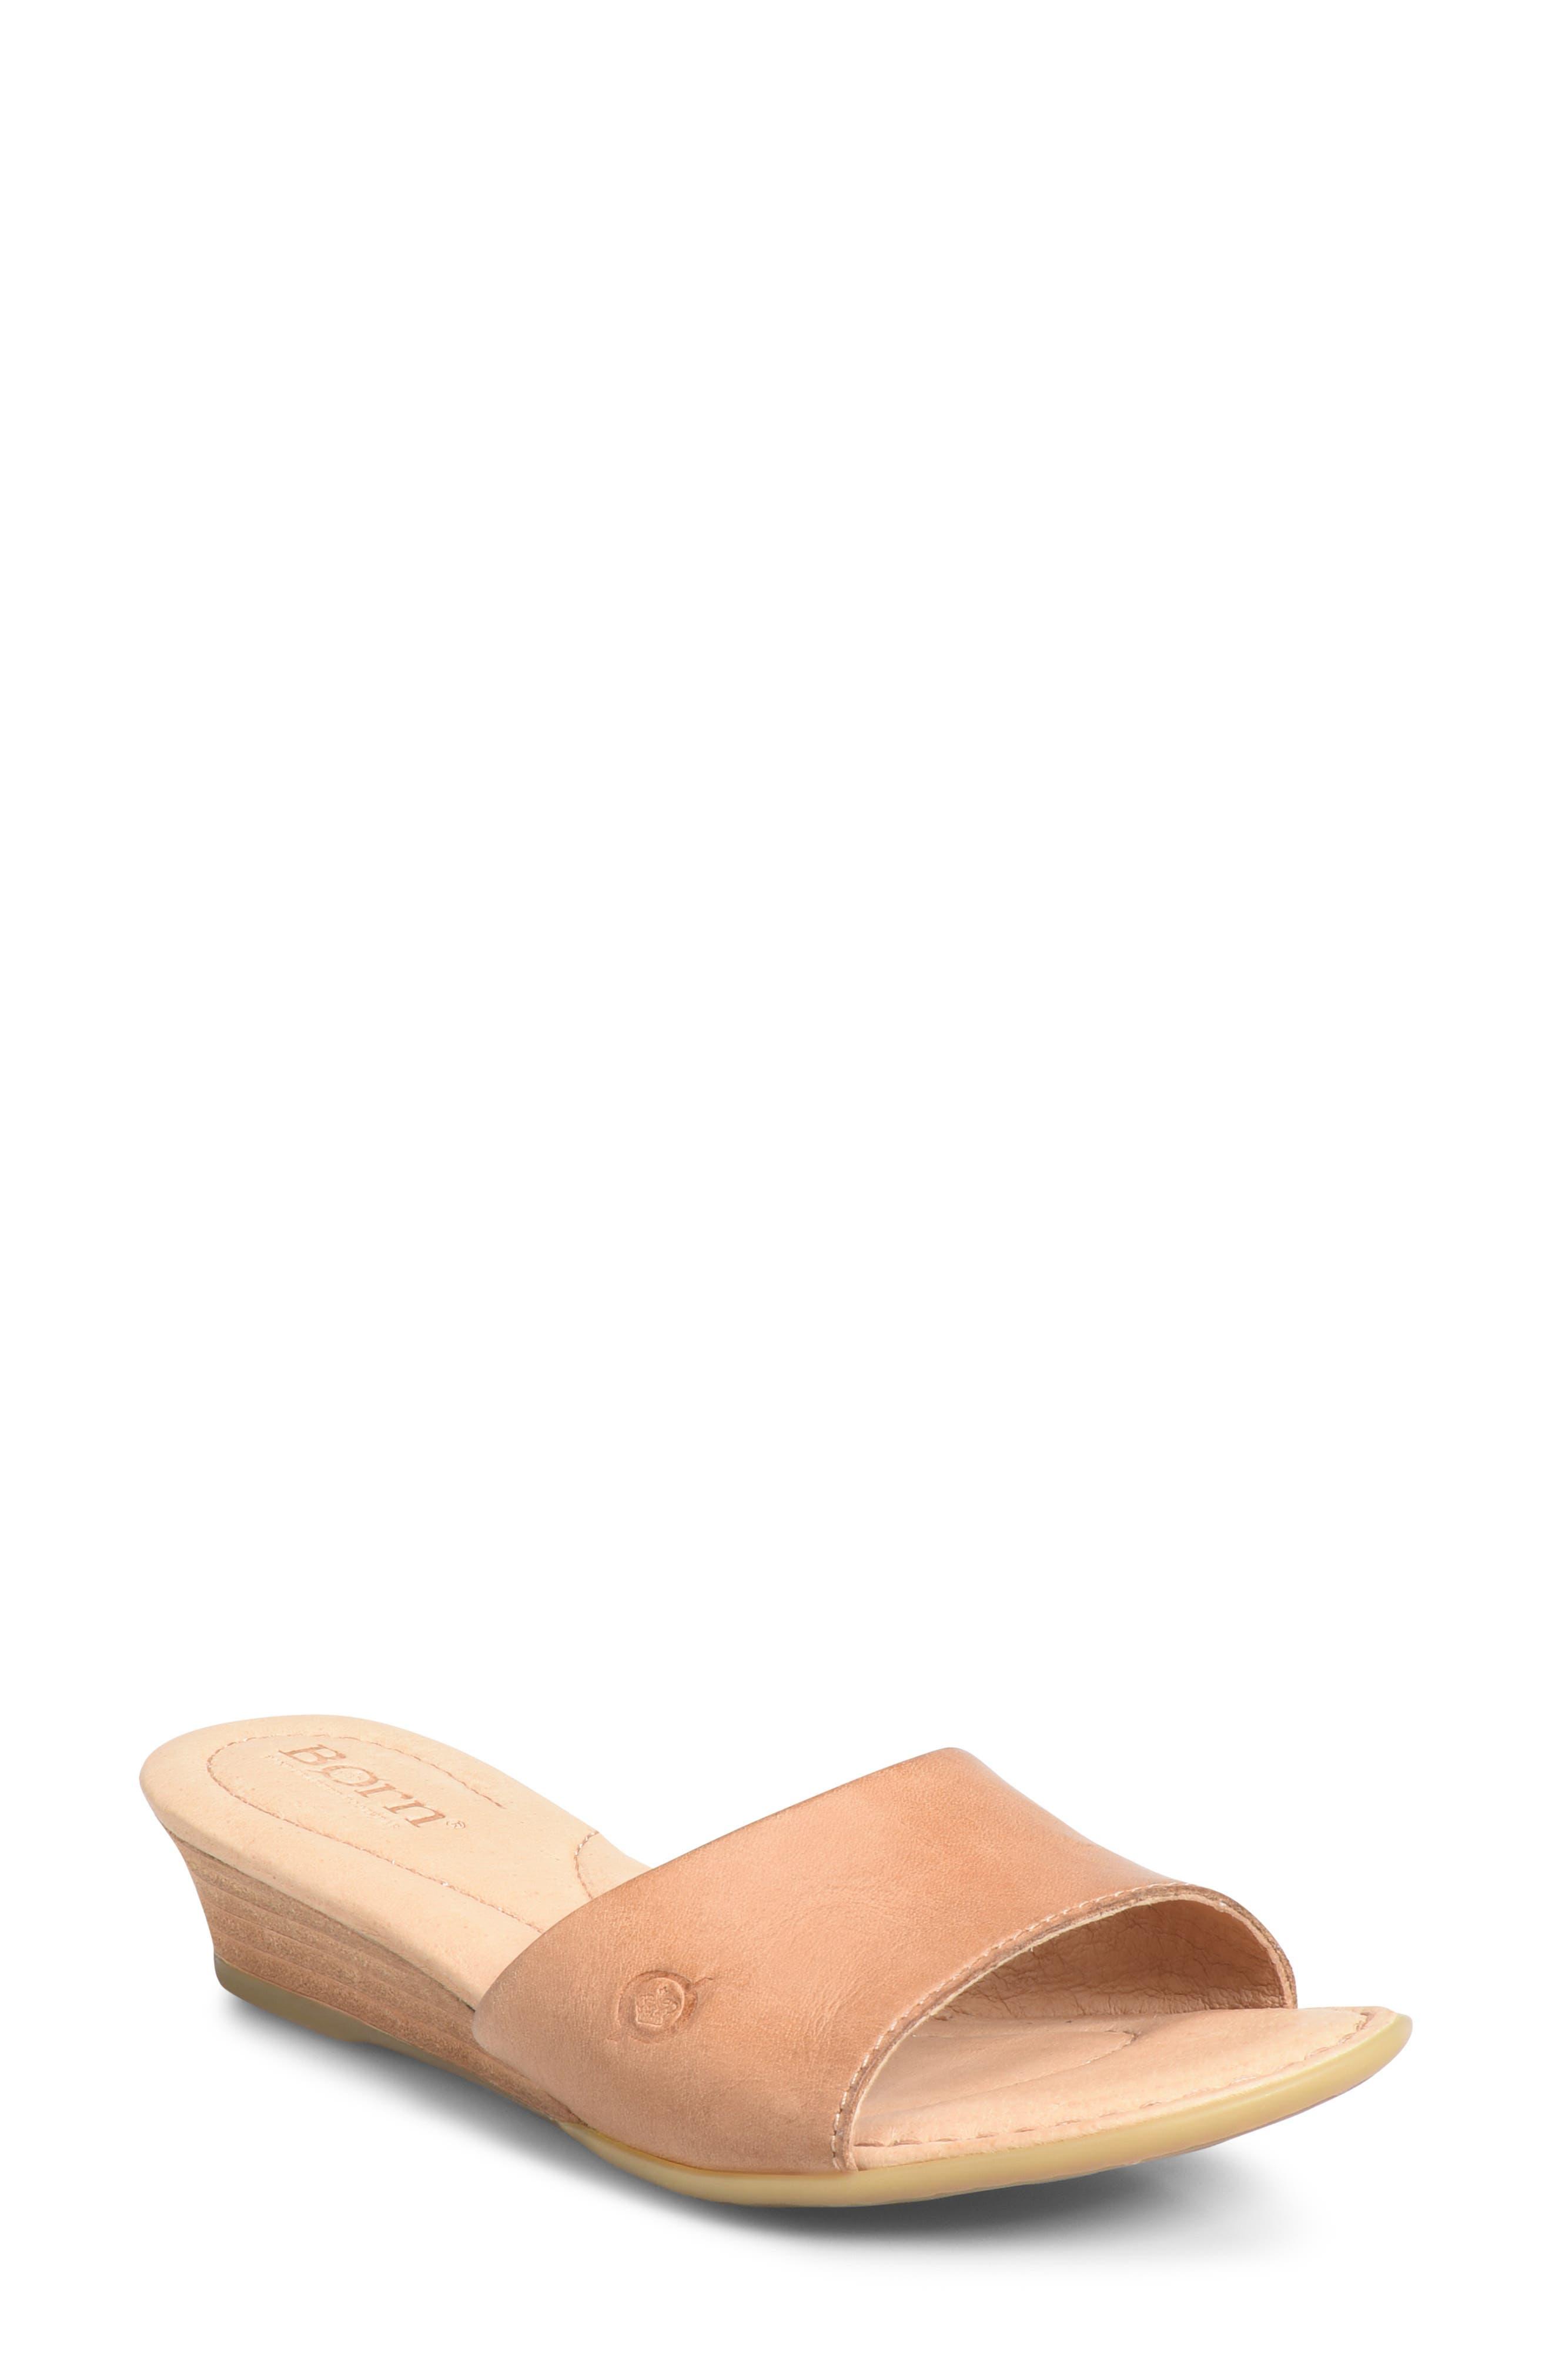 B?rn Shasta Wedge Slide Sandal, Brown